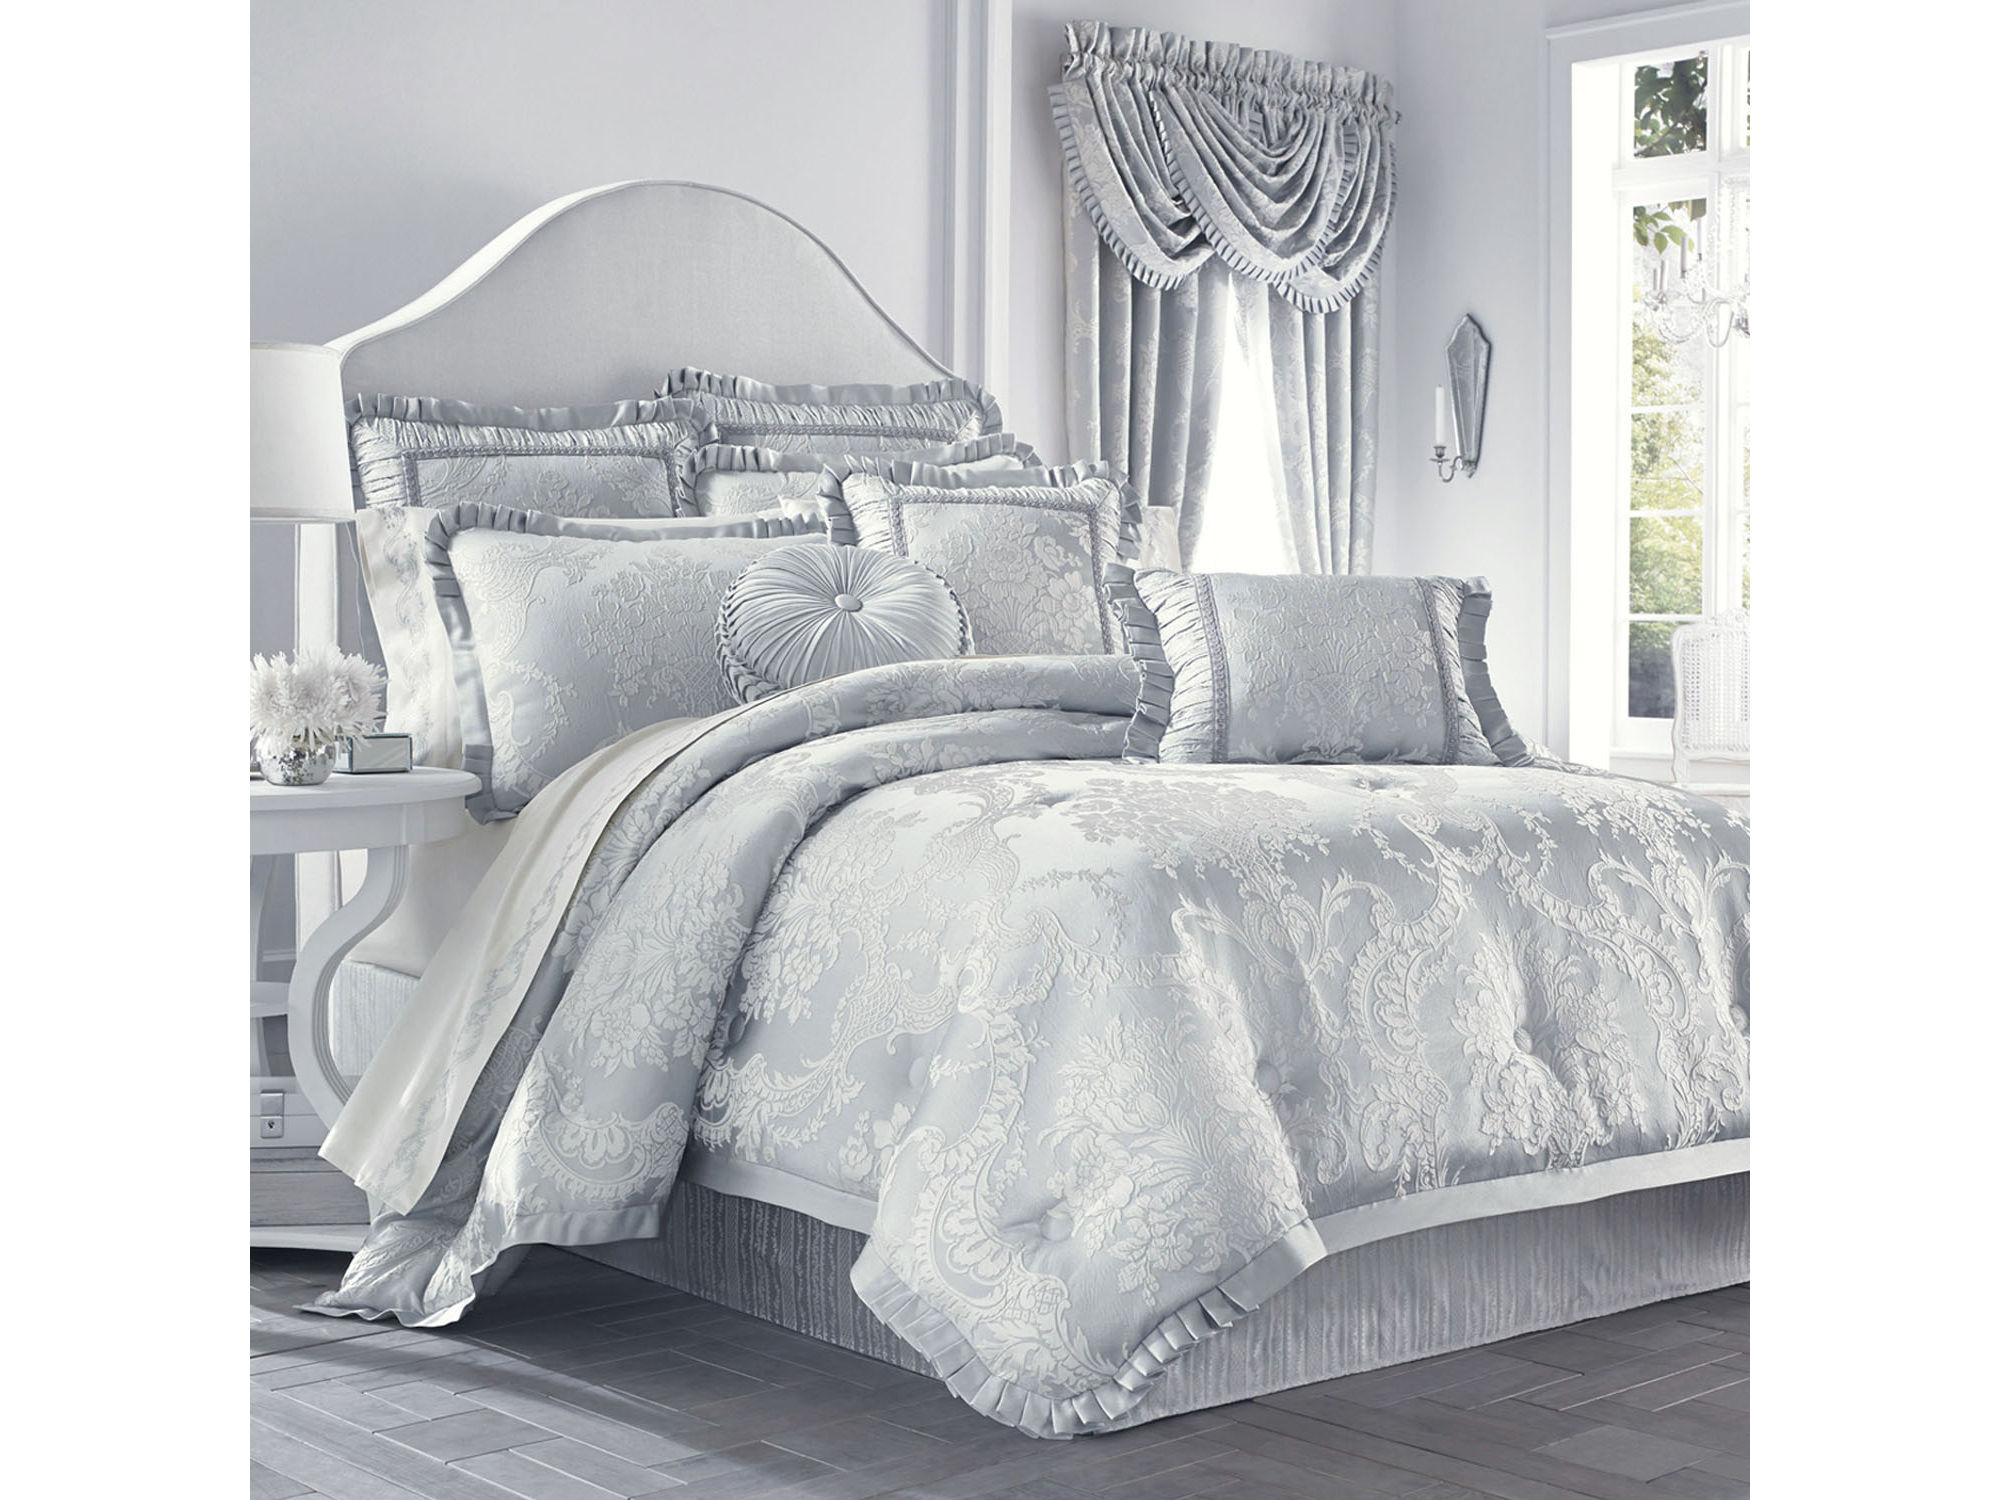 UPC J Queen New York Antoinette Bedding Collection